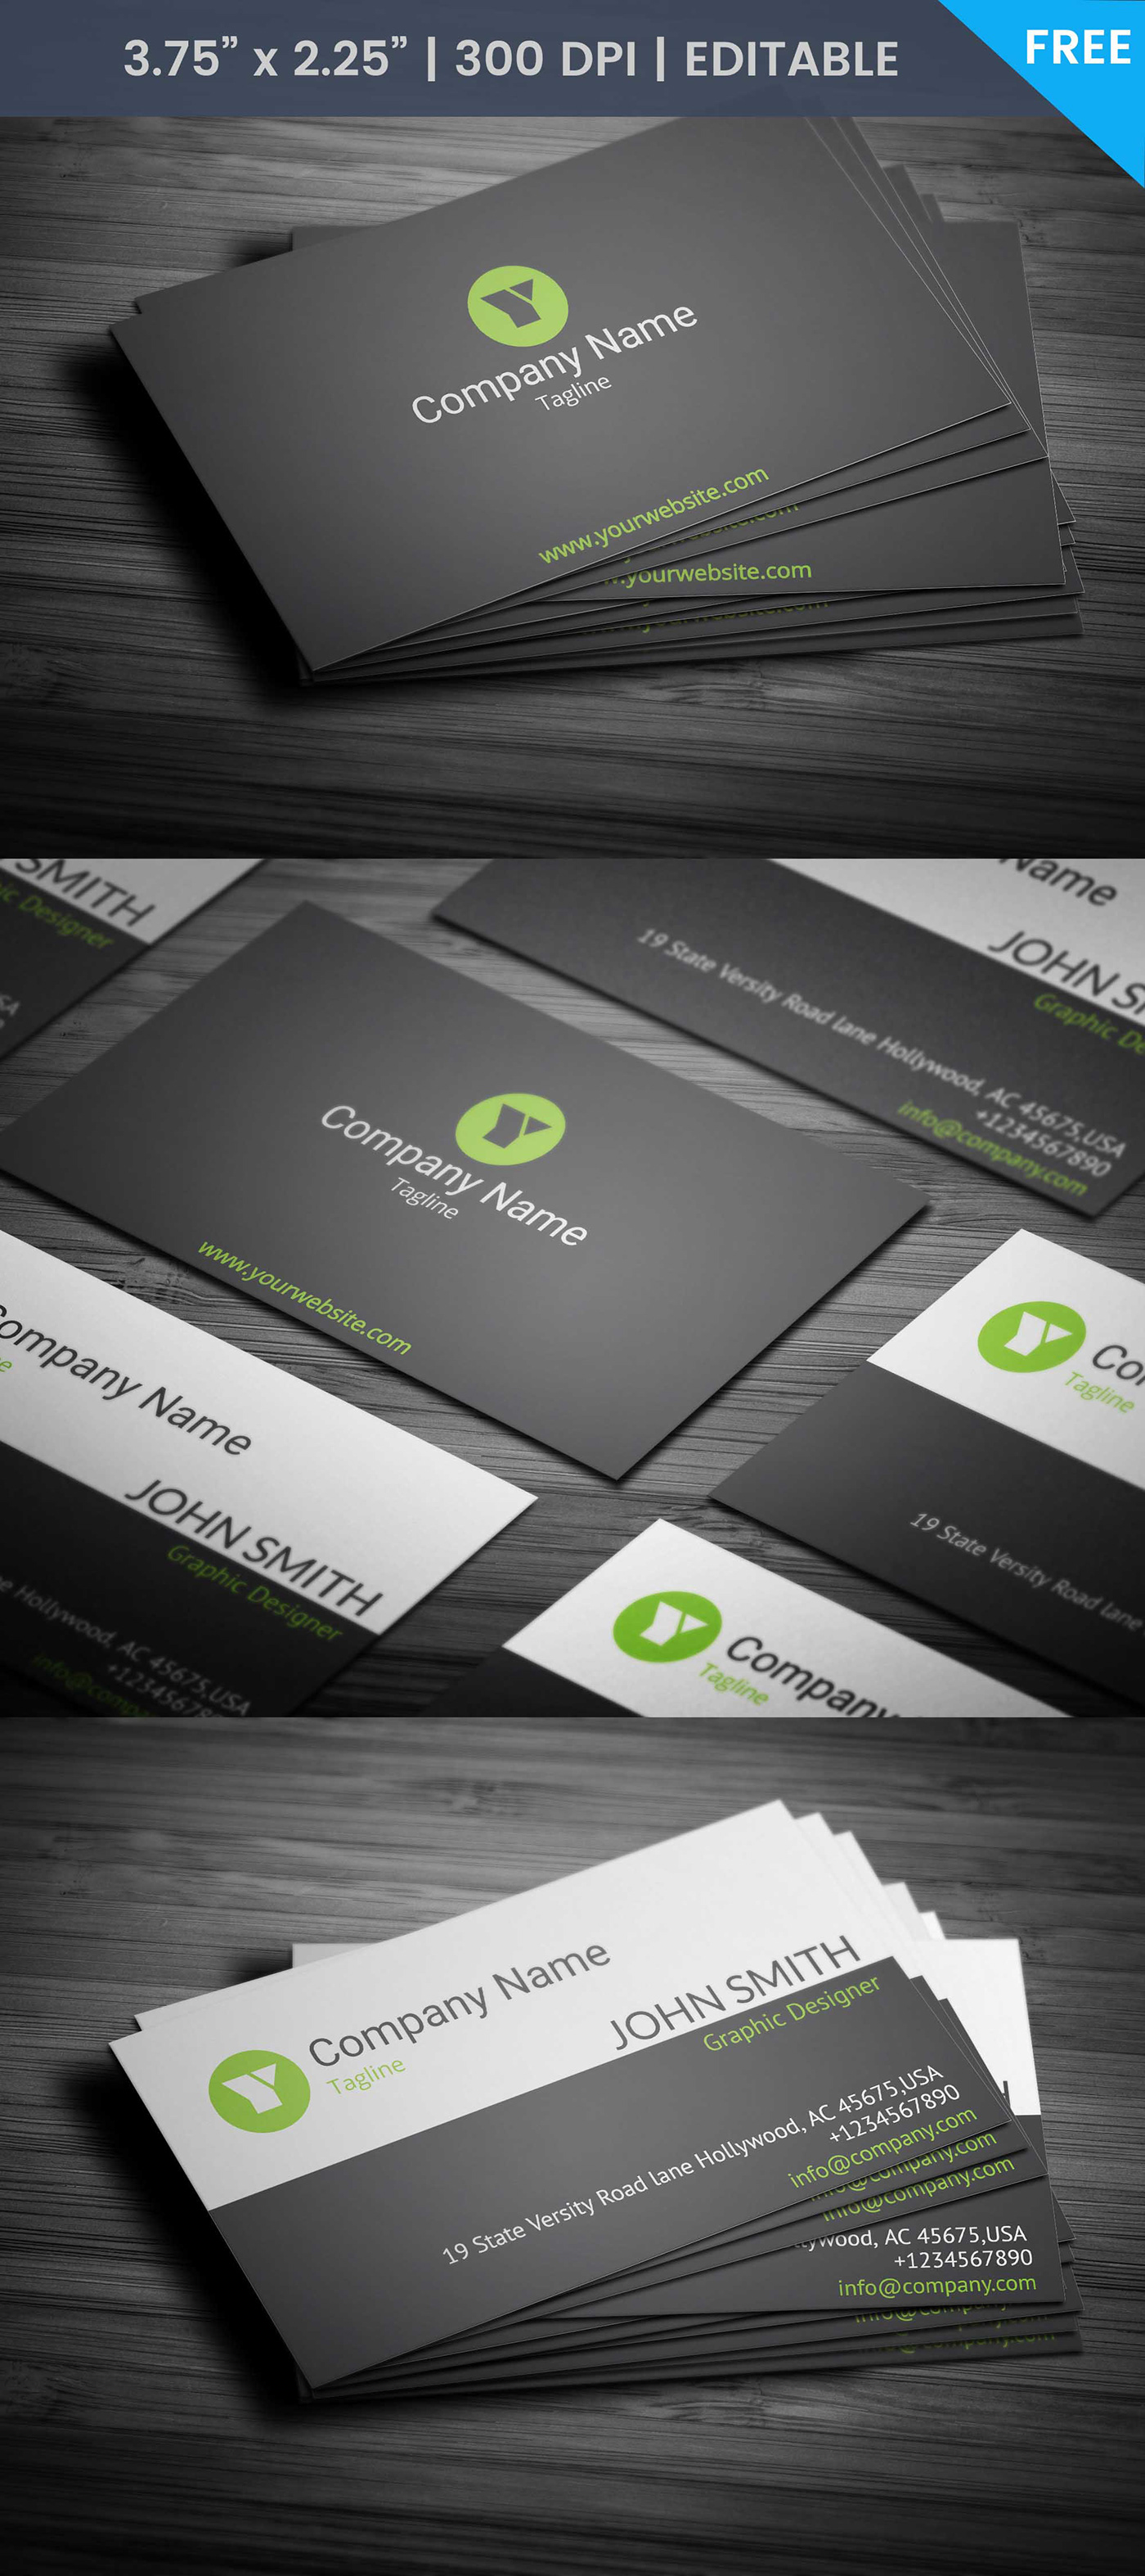 interior design  interior designer interior designer business Business card design